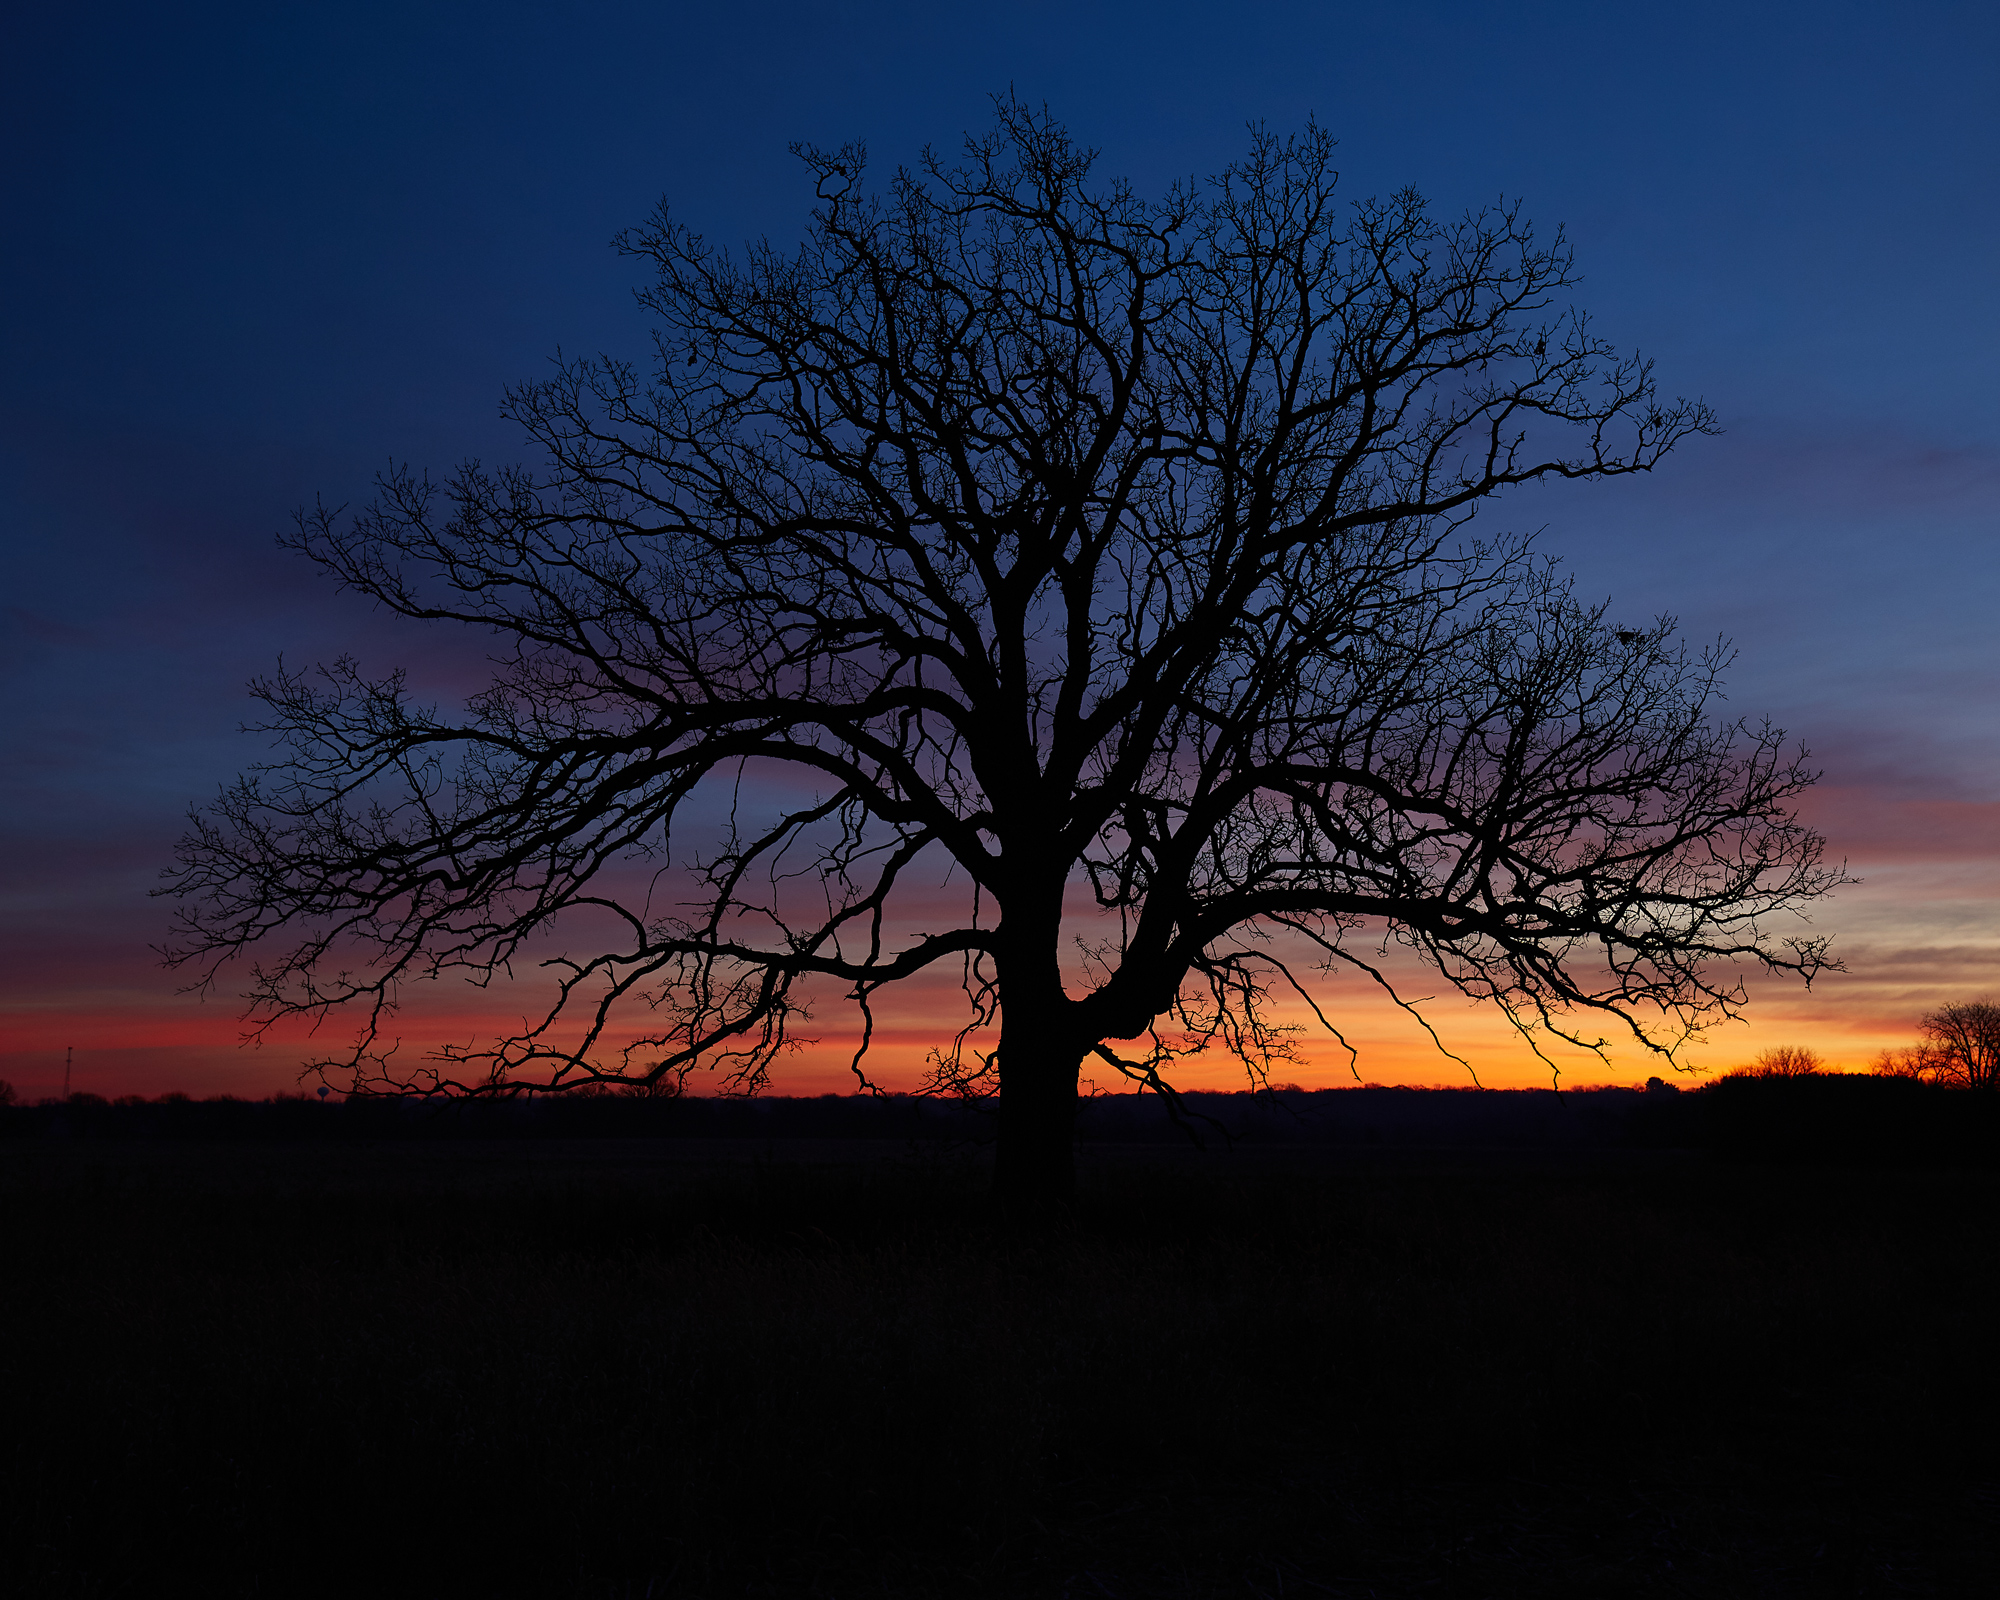 Sunrise Tree, No. 1